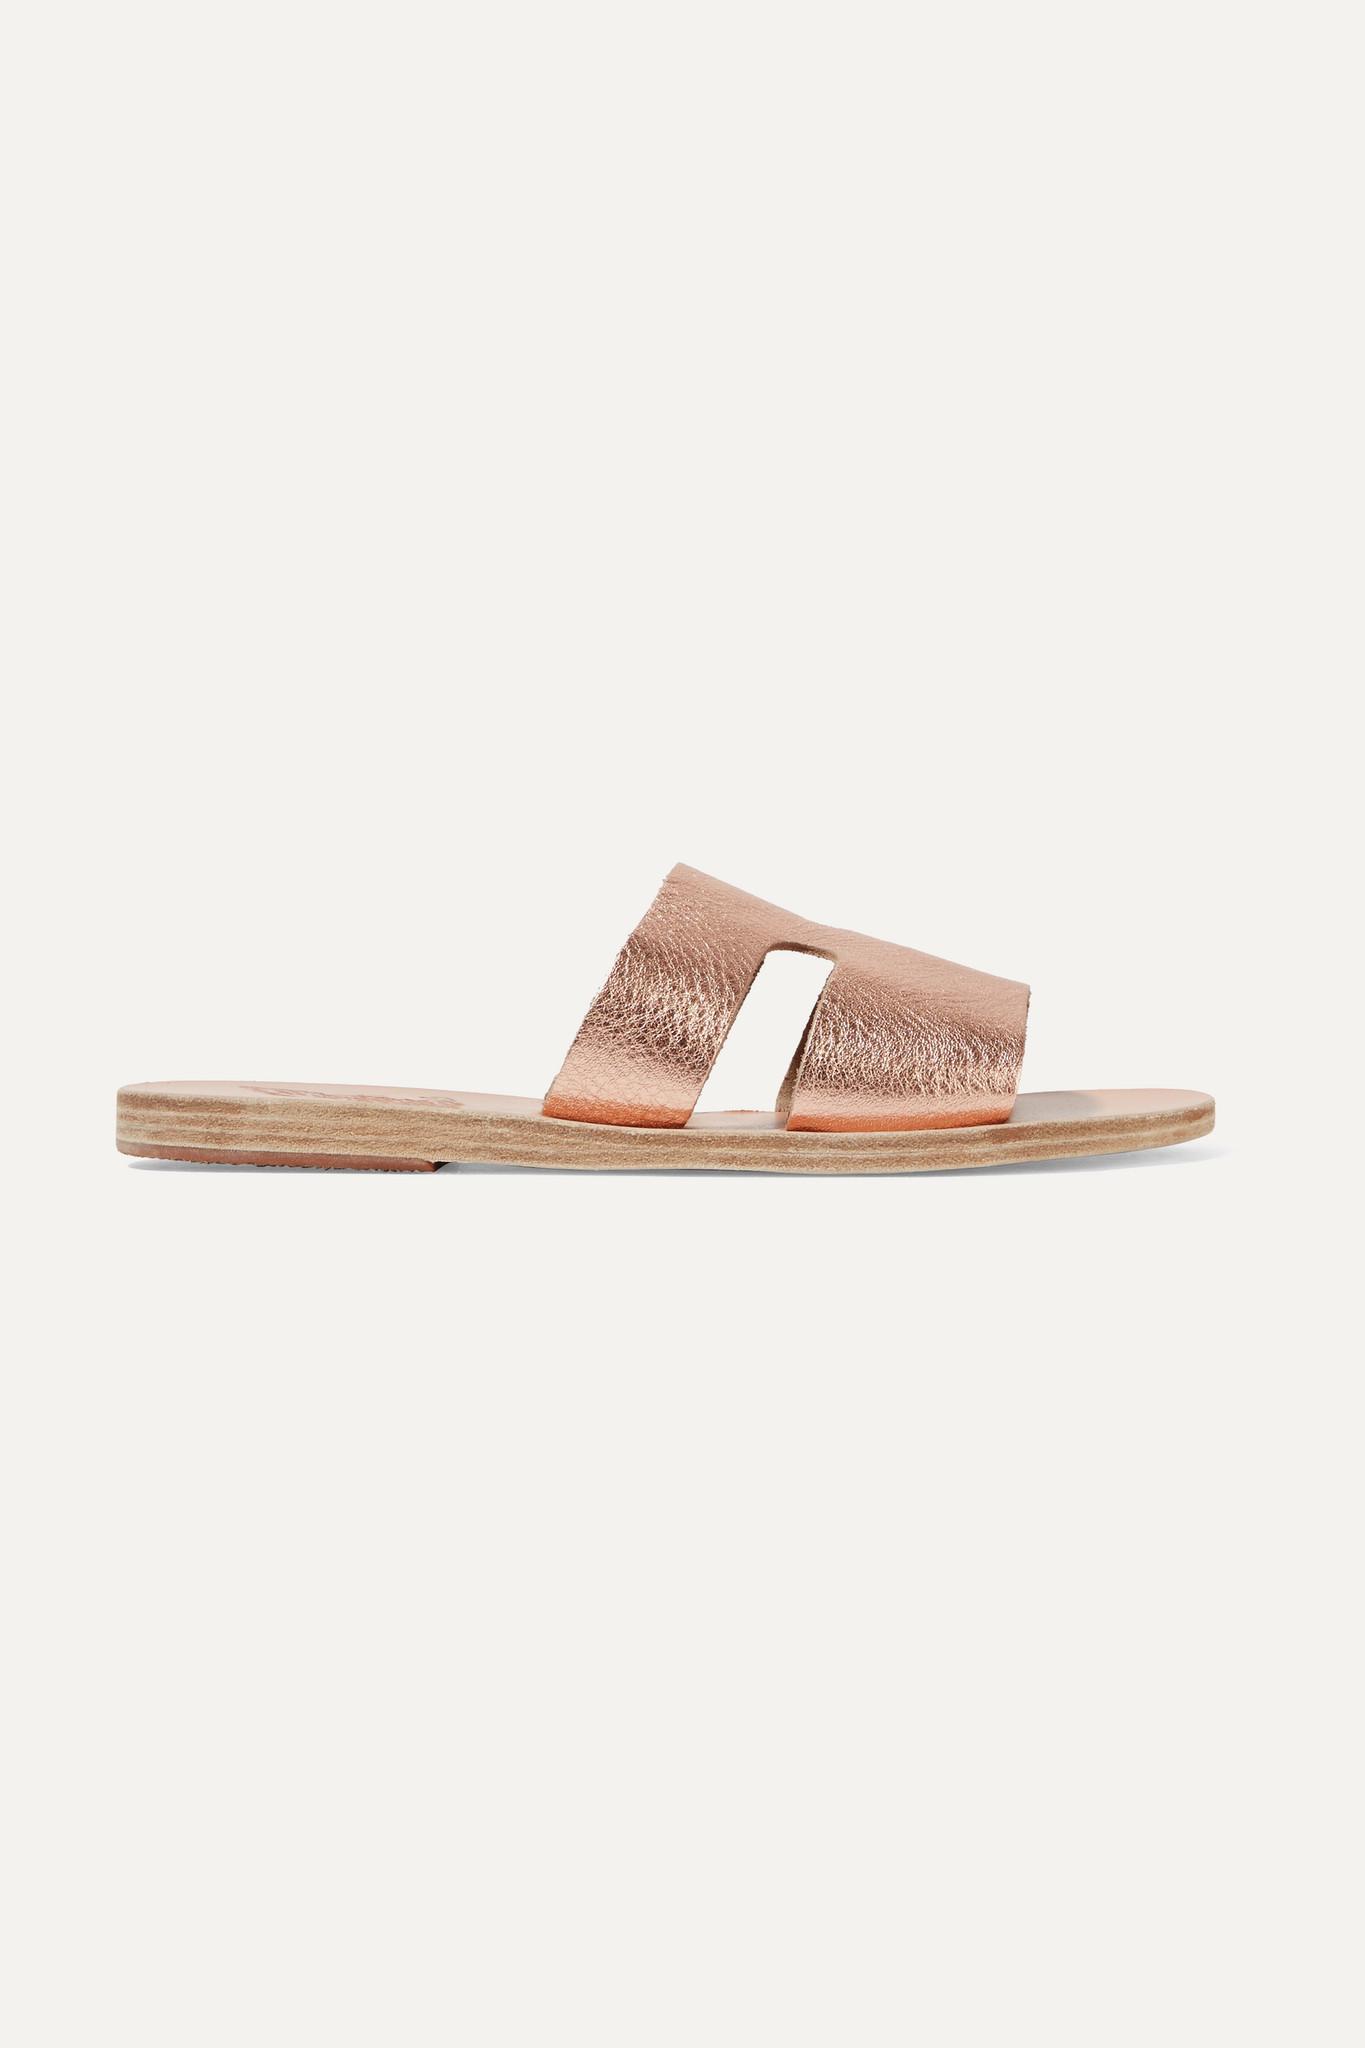 ANCIENT GREEK SANDALS - Apteros 编织酒椰叶纤维皮革拖鞋 - 粉红色 - IT40